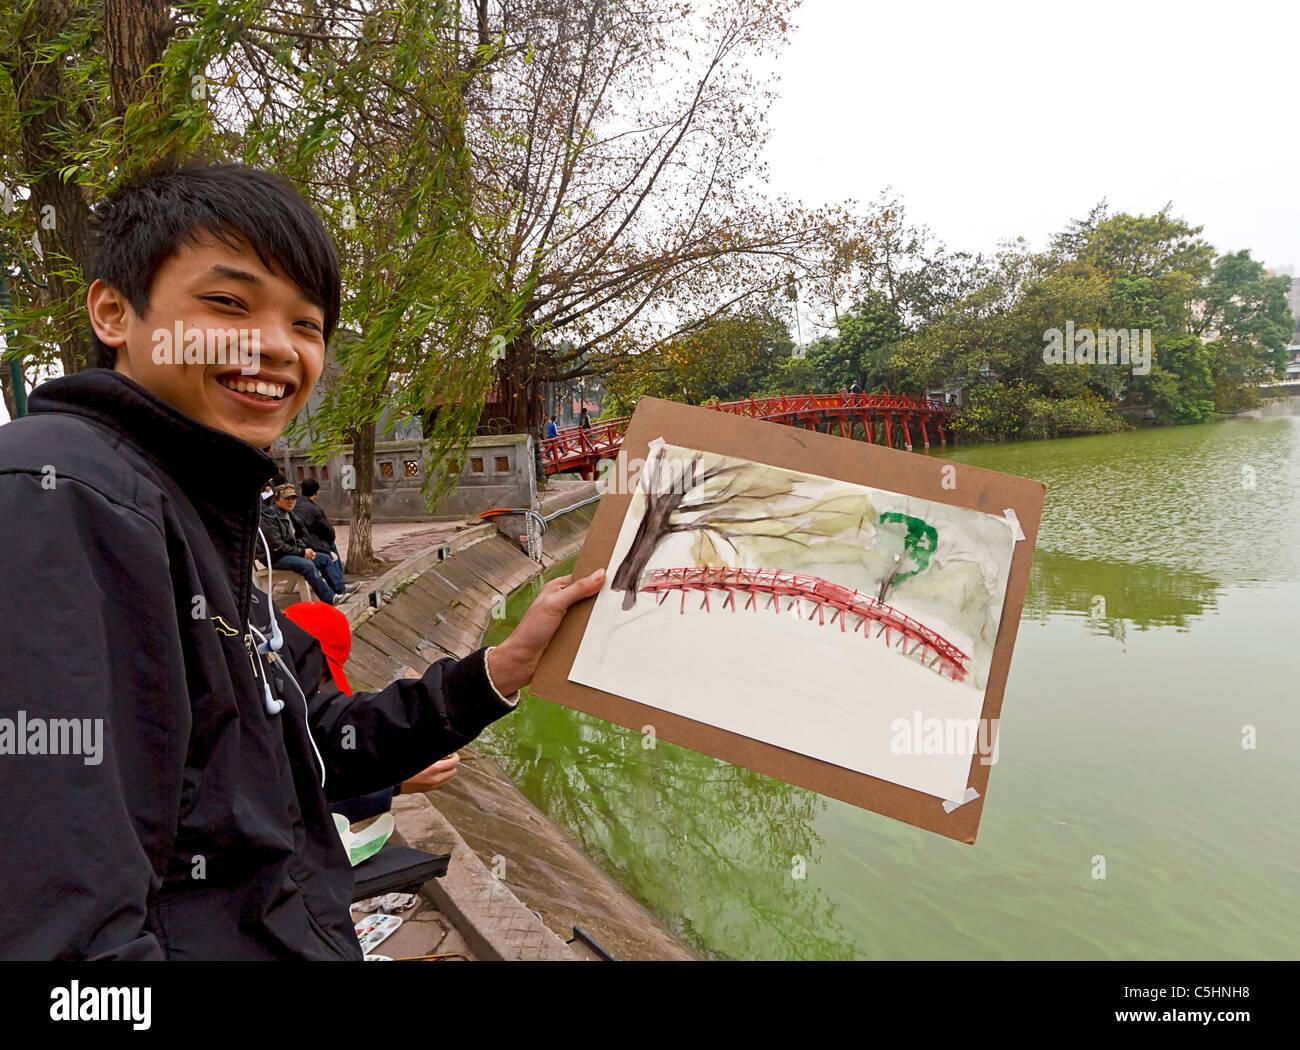 Local young men paint popular red bridge over Hoan Kiem Lake in the historical center of Hanoi, Vietnam. - Stock Image